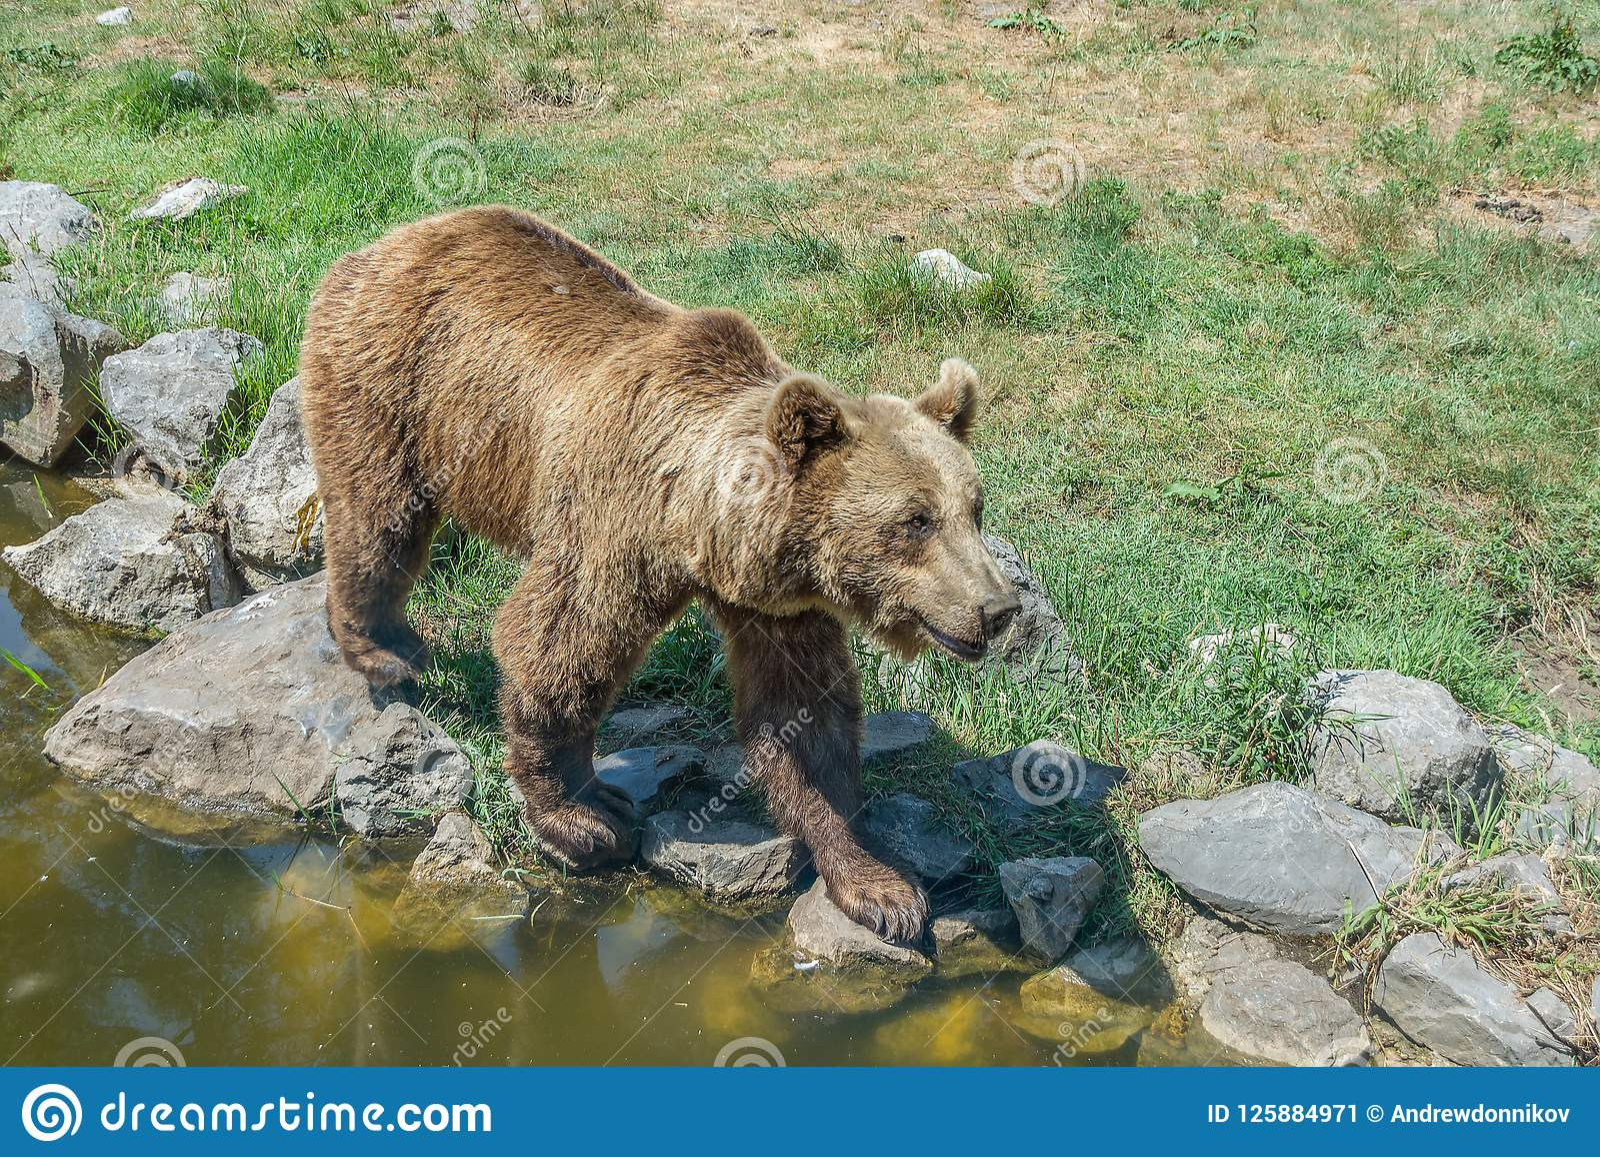 Бурый медведь идет на скалистый берег